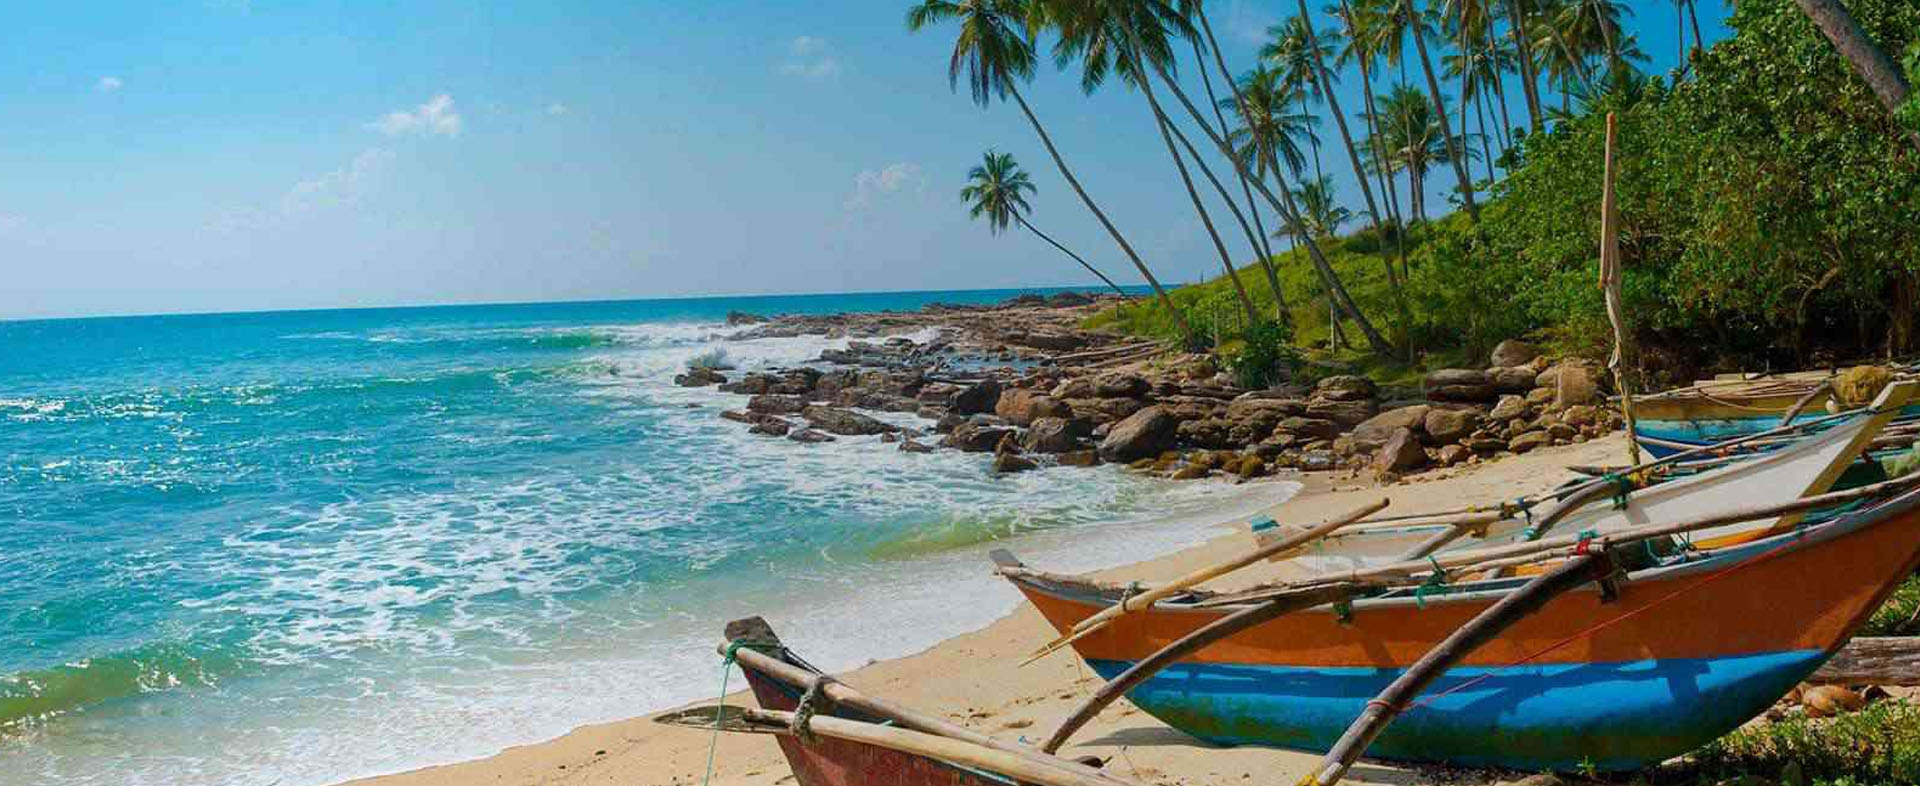 Luxurious Beach Holiday